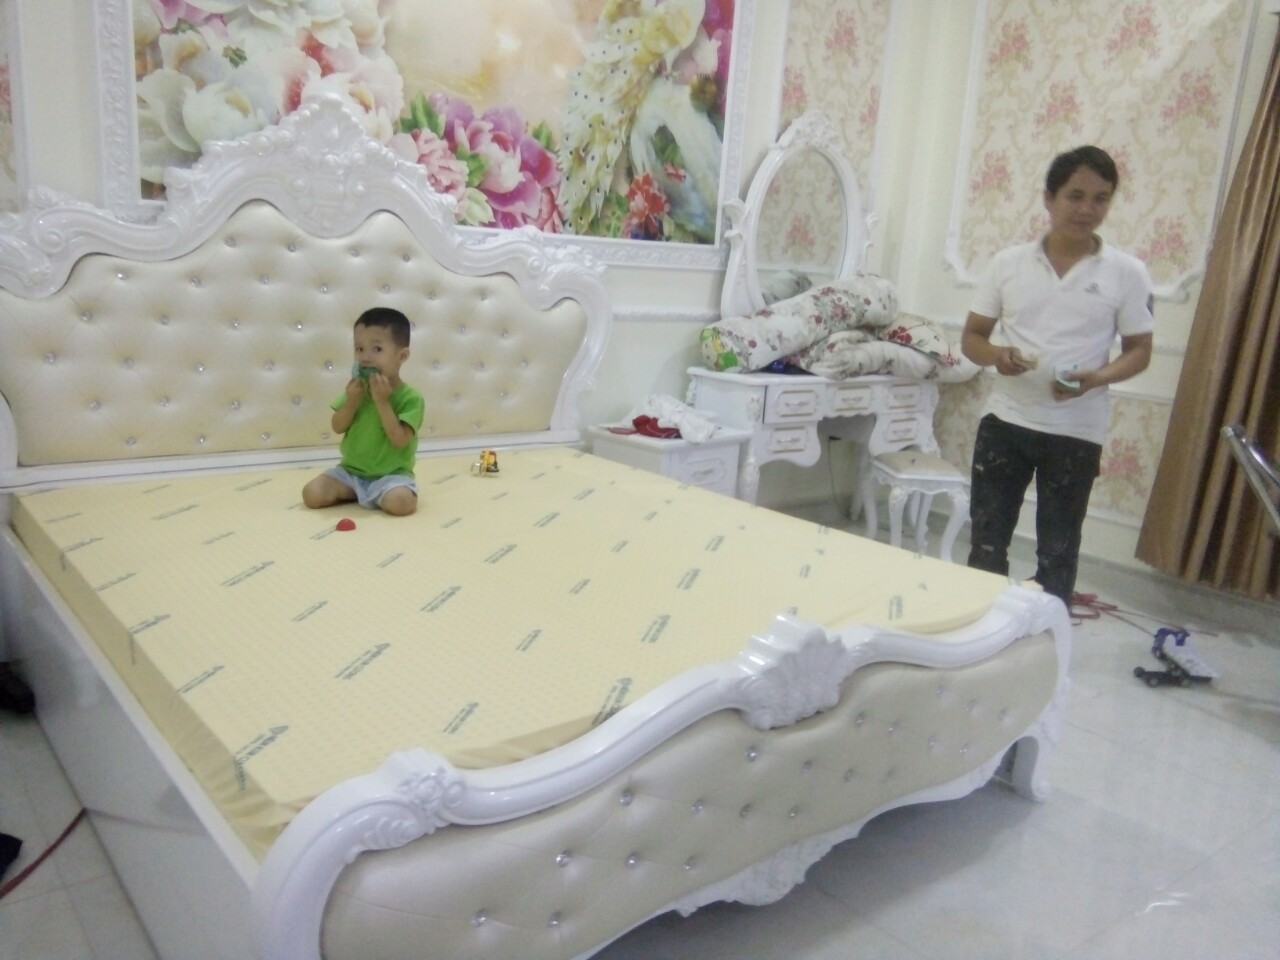 Nệm Cao Su KIm Cương an toàn sức khỏe